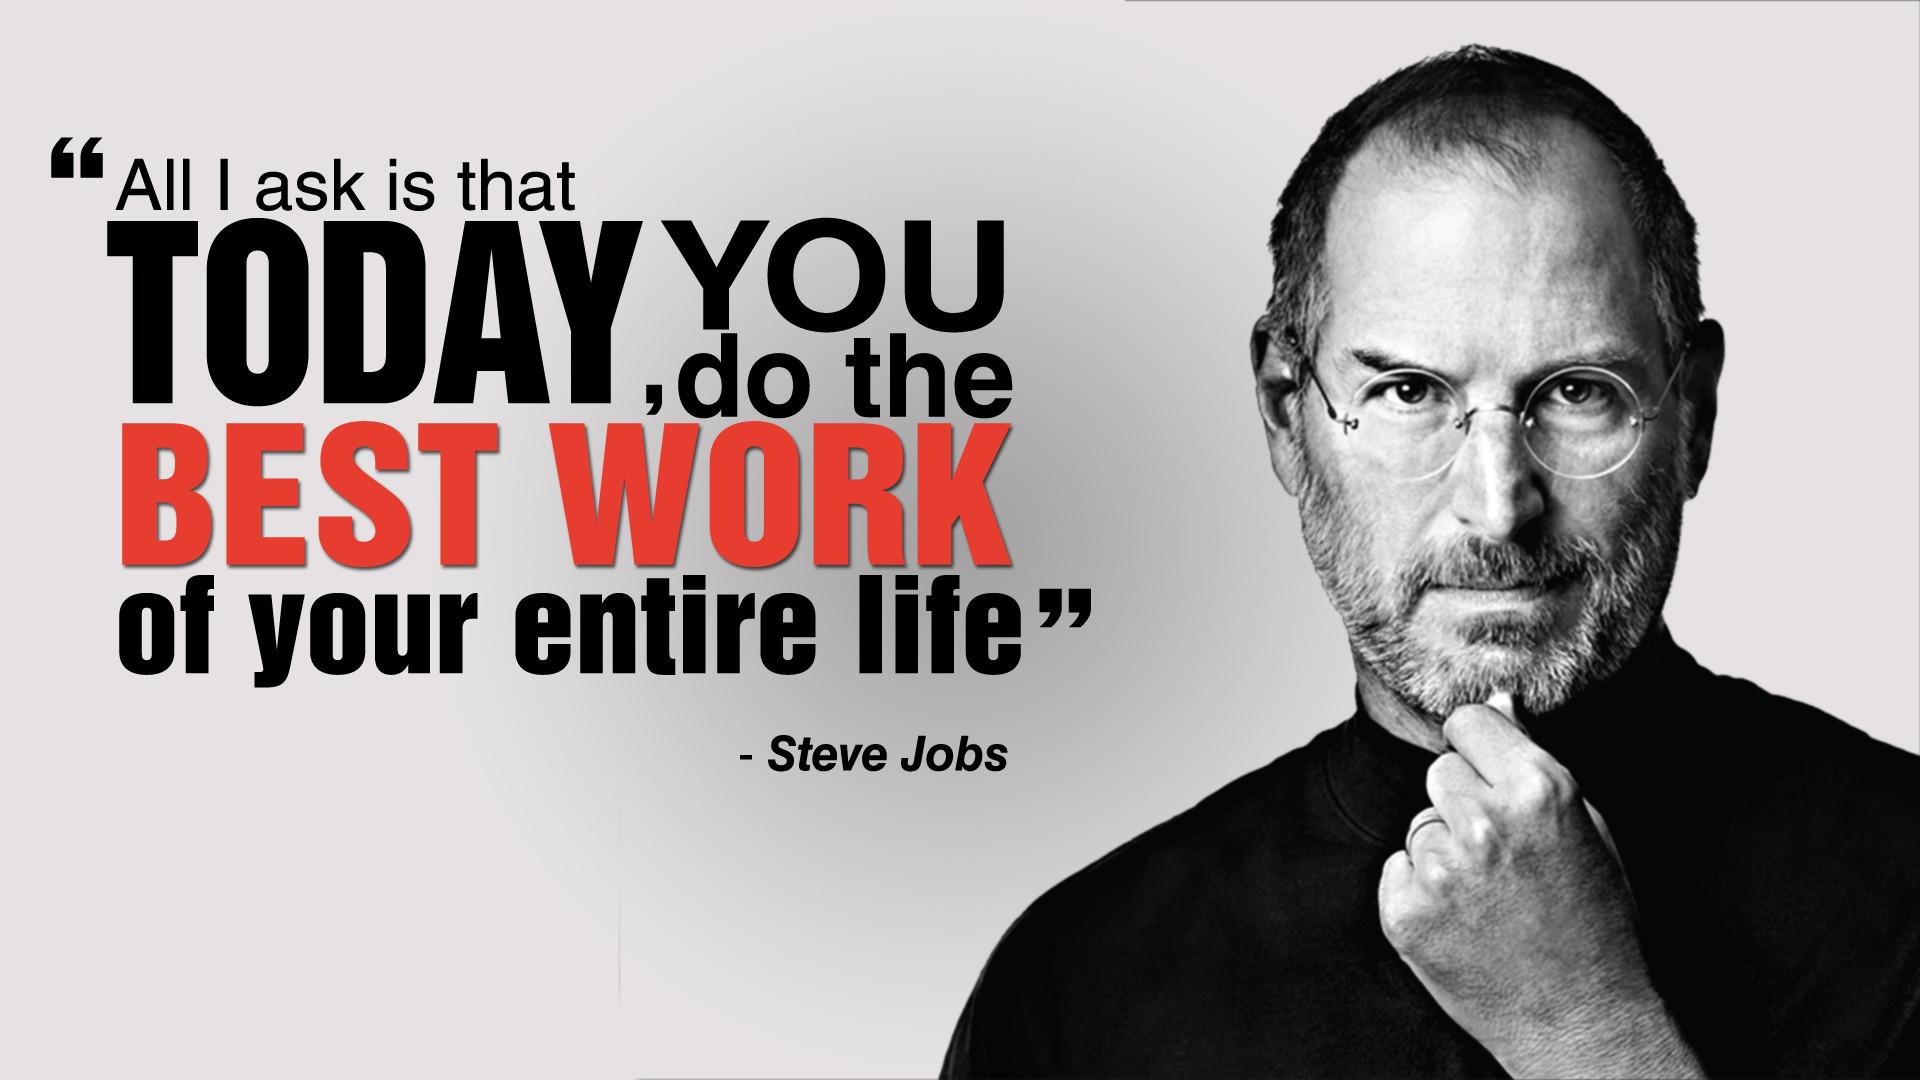 Today Your Best Work Steve Jobs - HD Wallpaper